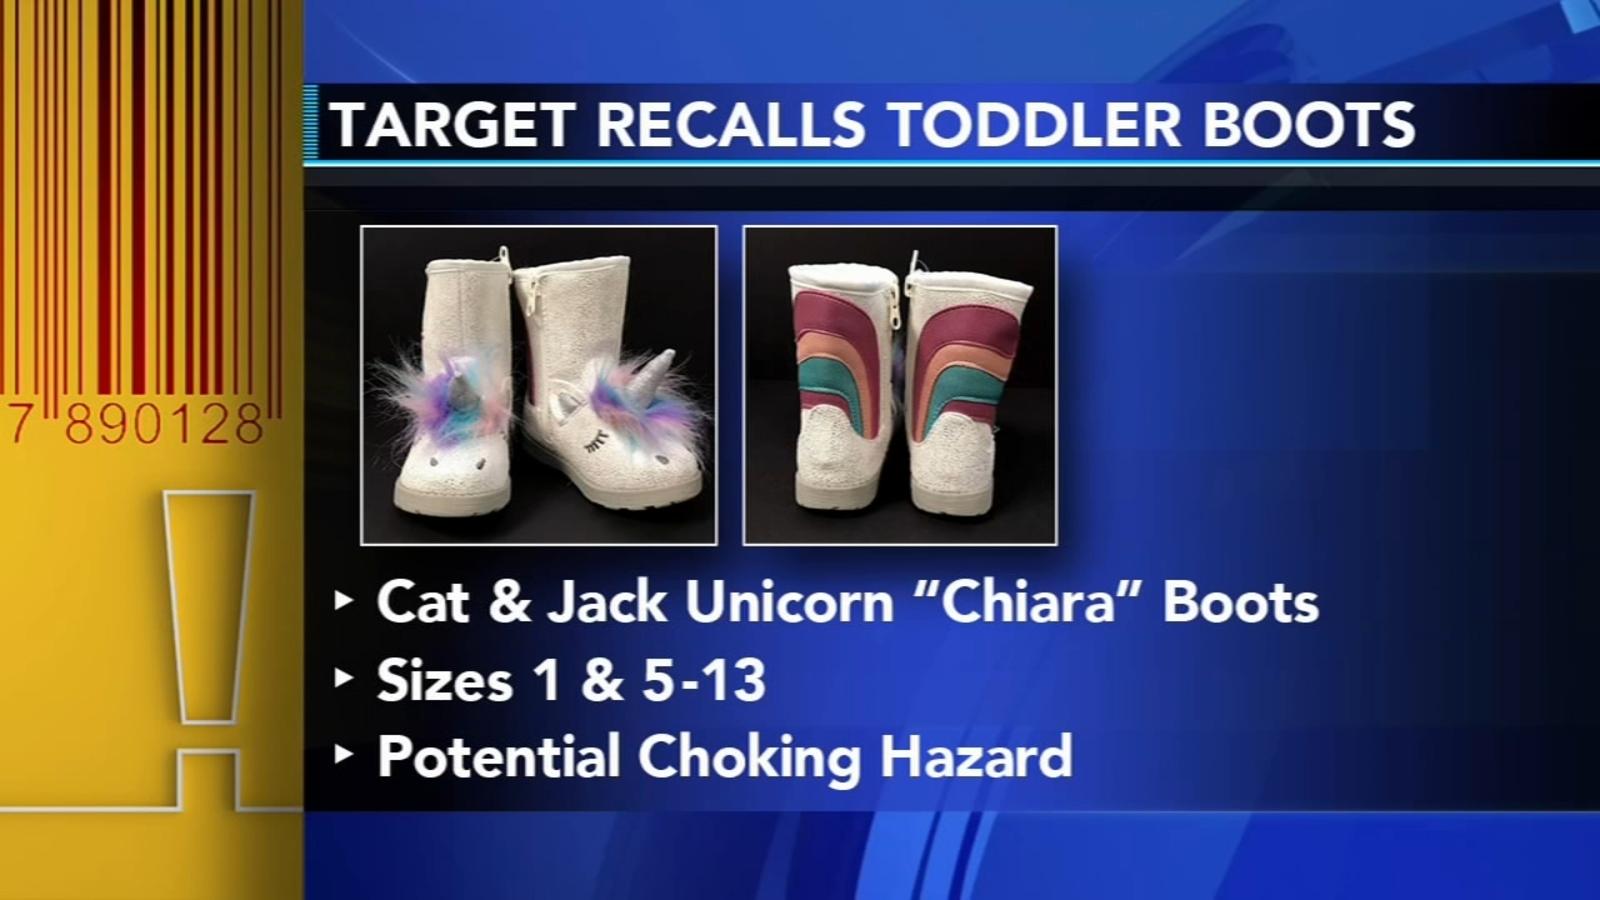 8b8b342966f5 Target recalls Cat and Jack Chiara unicorn toddler boots